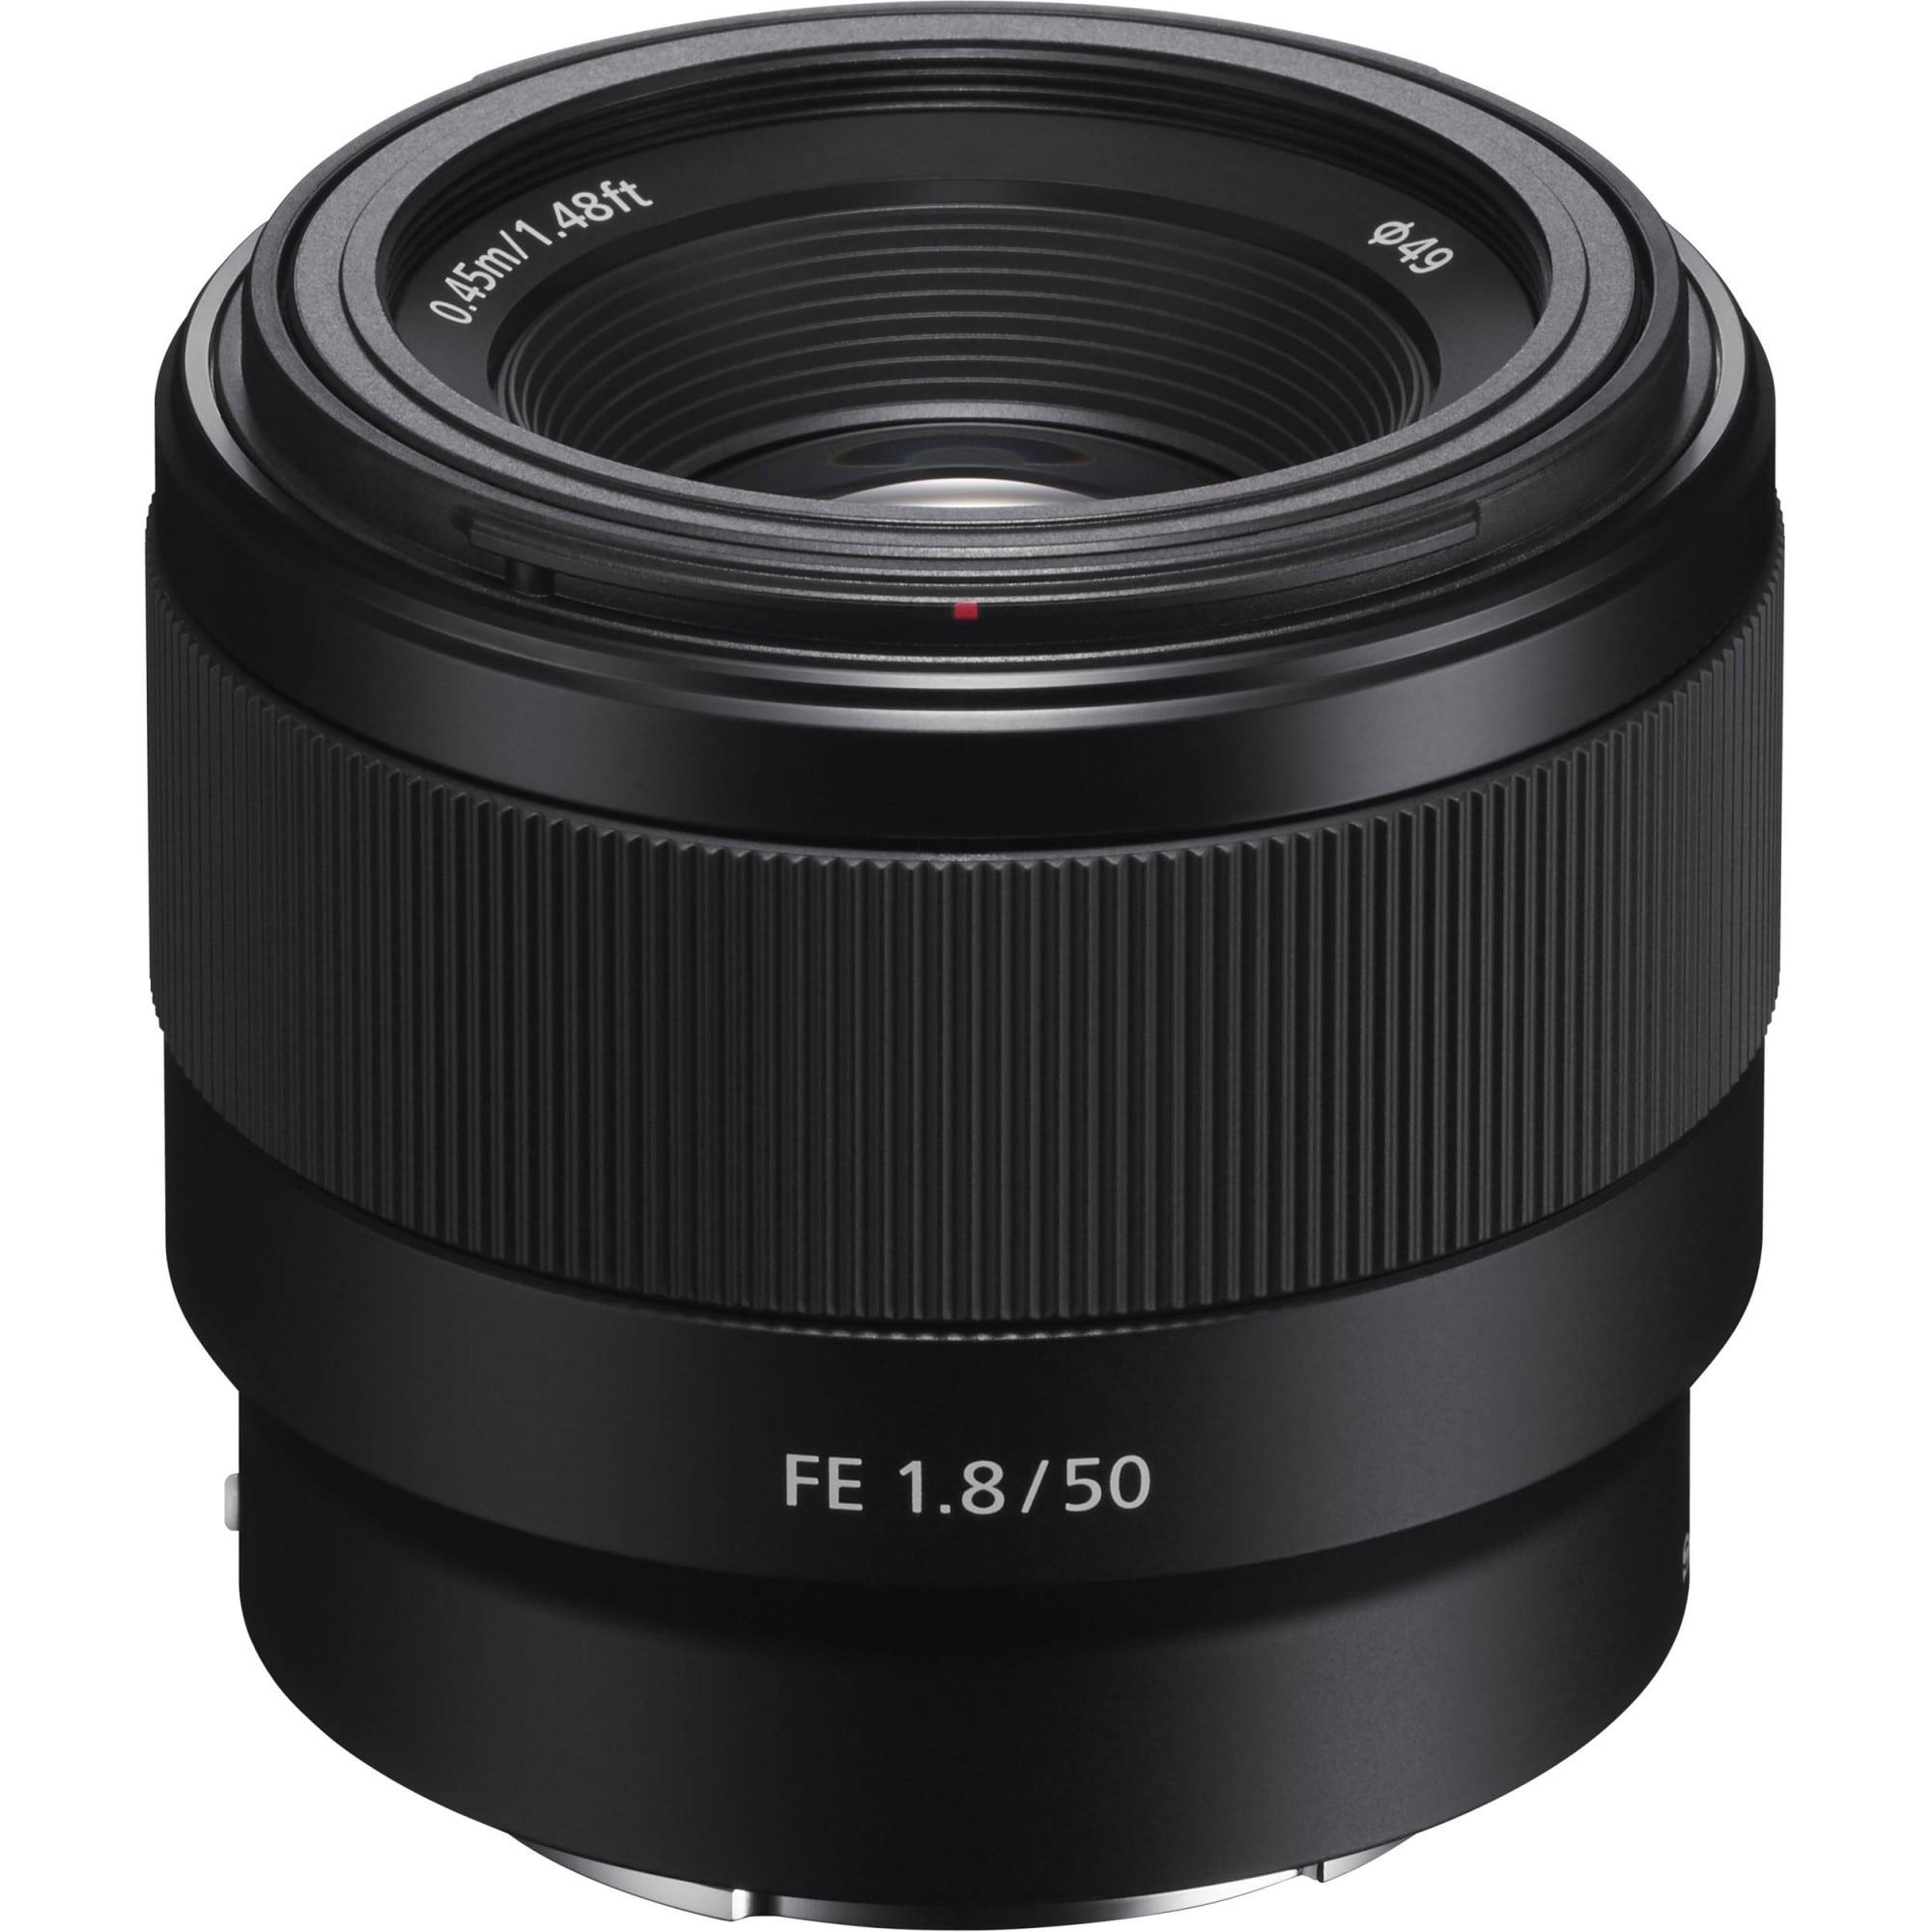 Fotografie Obiectiv Sony, montura FE, 50mm. f1.8, Negru